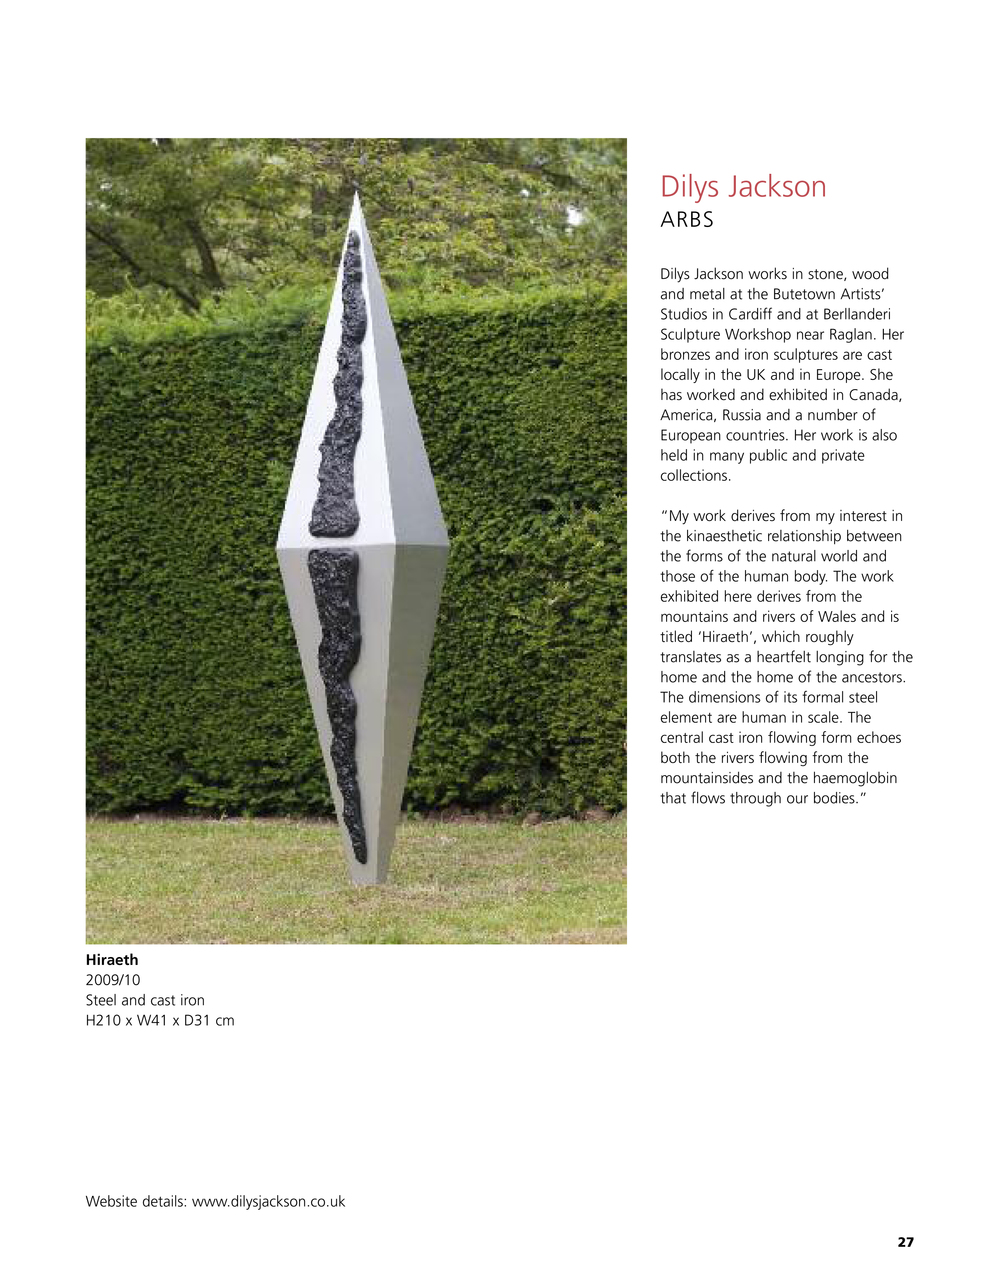 sculpturebooklet 2010 Leicester-27.jpg